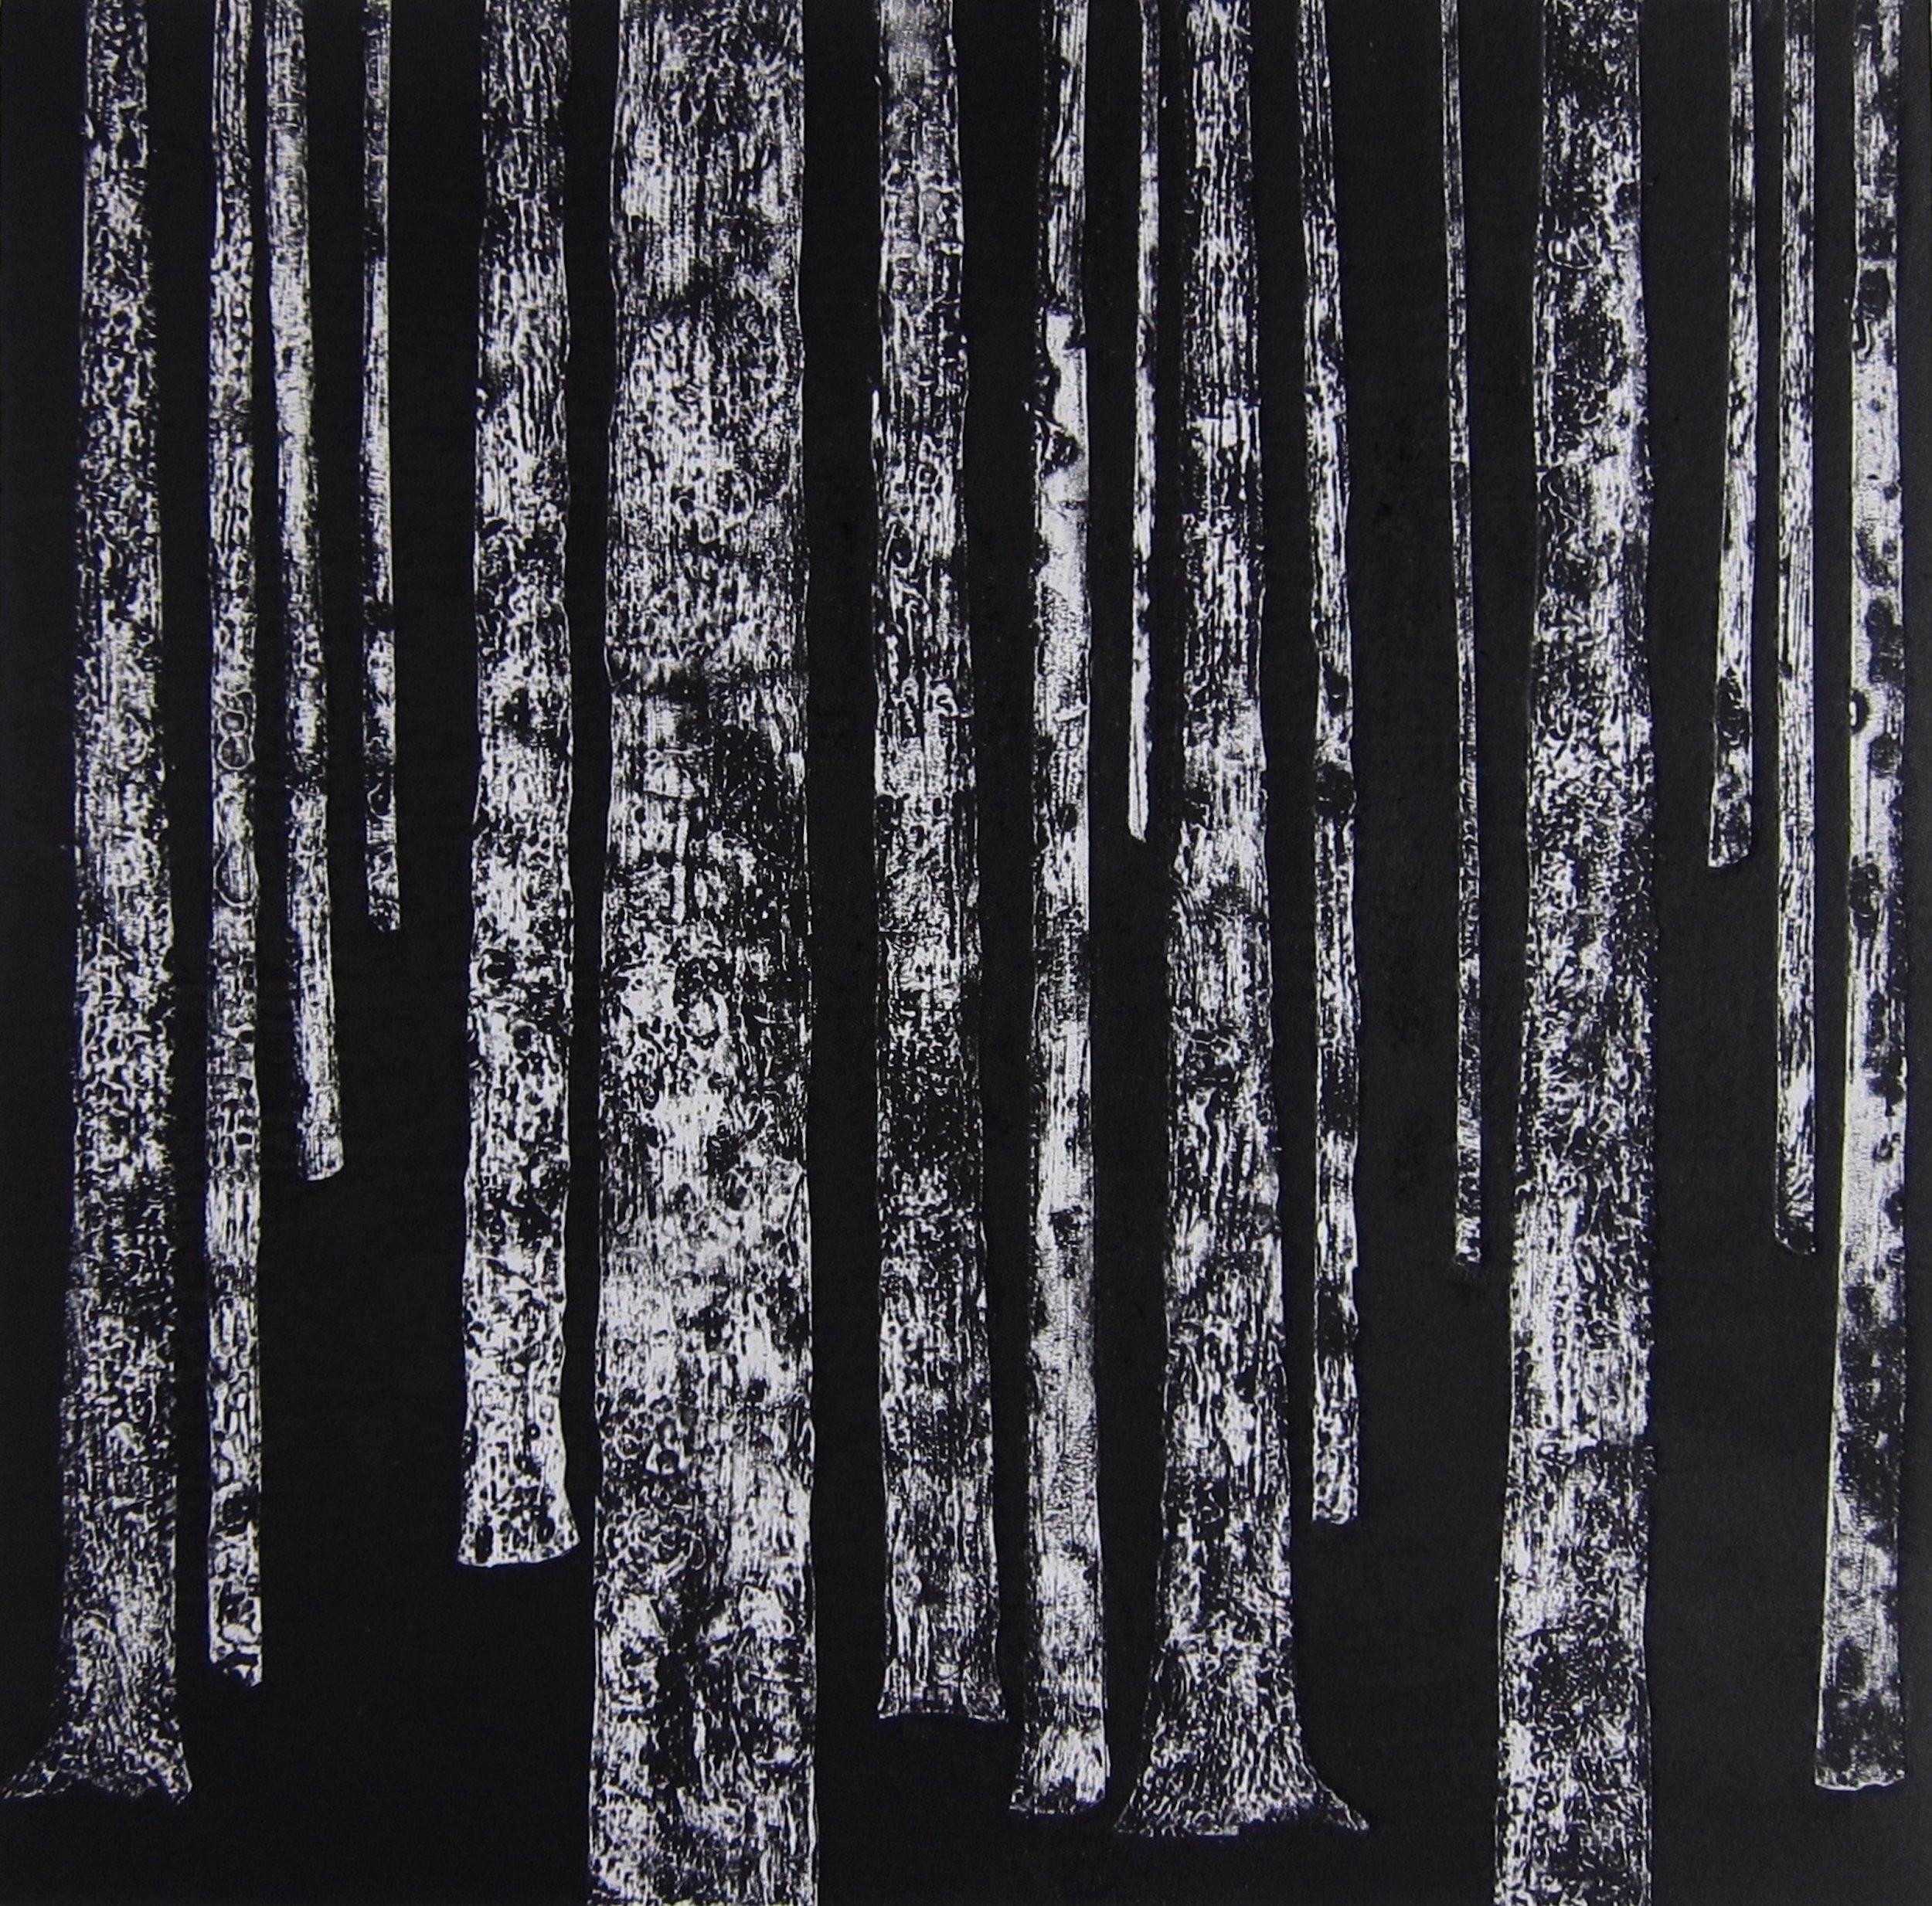 Dark Forrest  silk aquatint  48 x 48 cm  £260